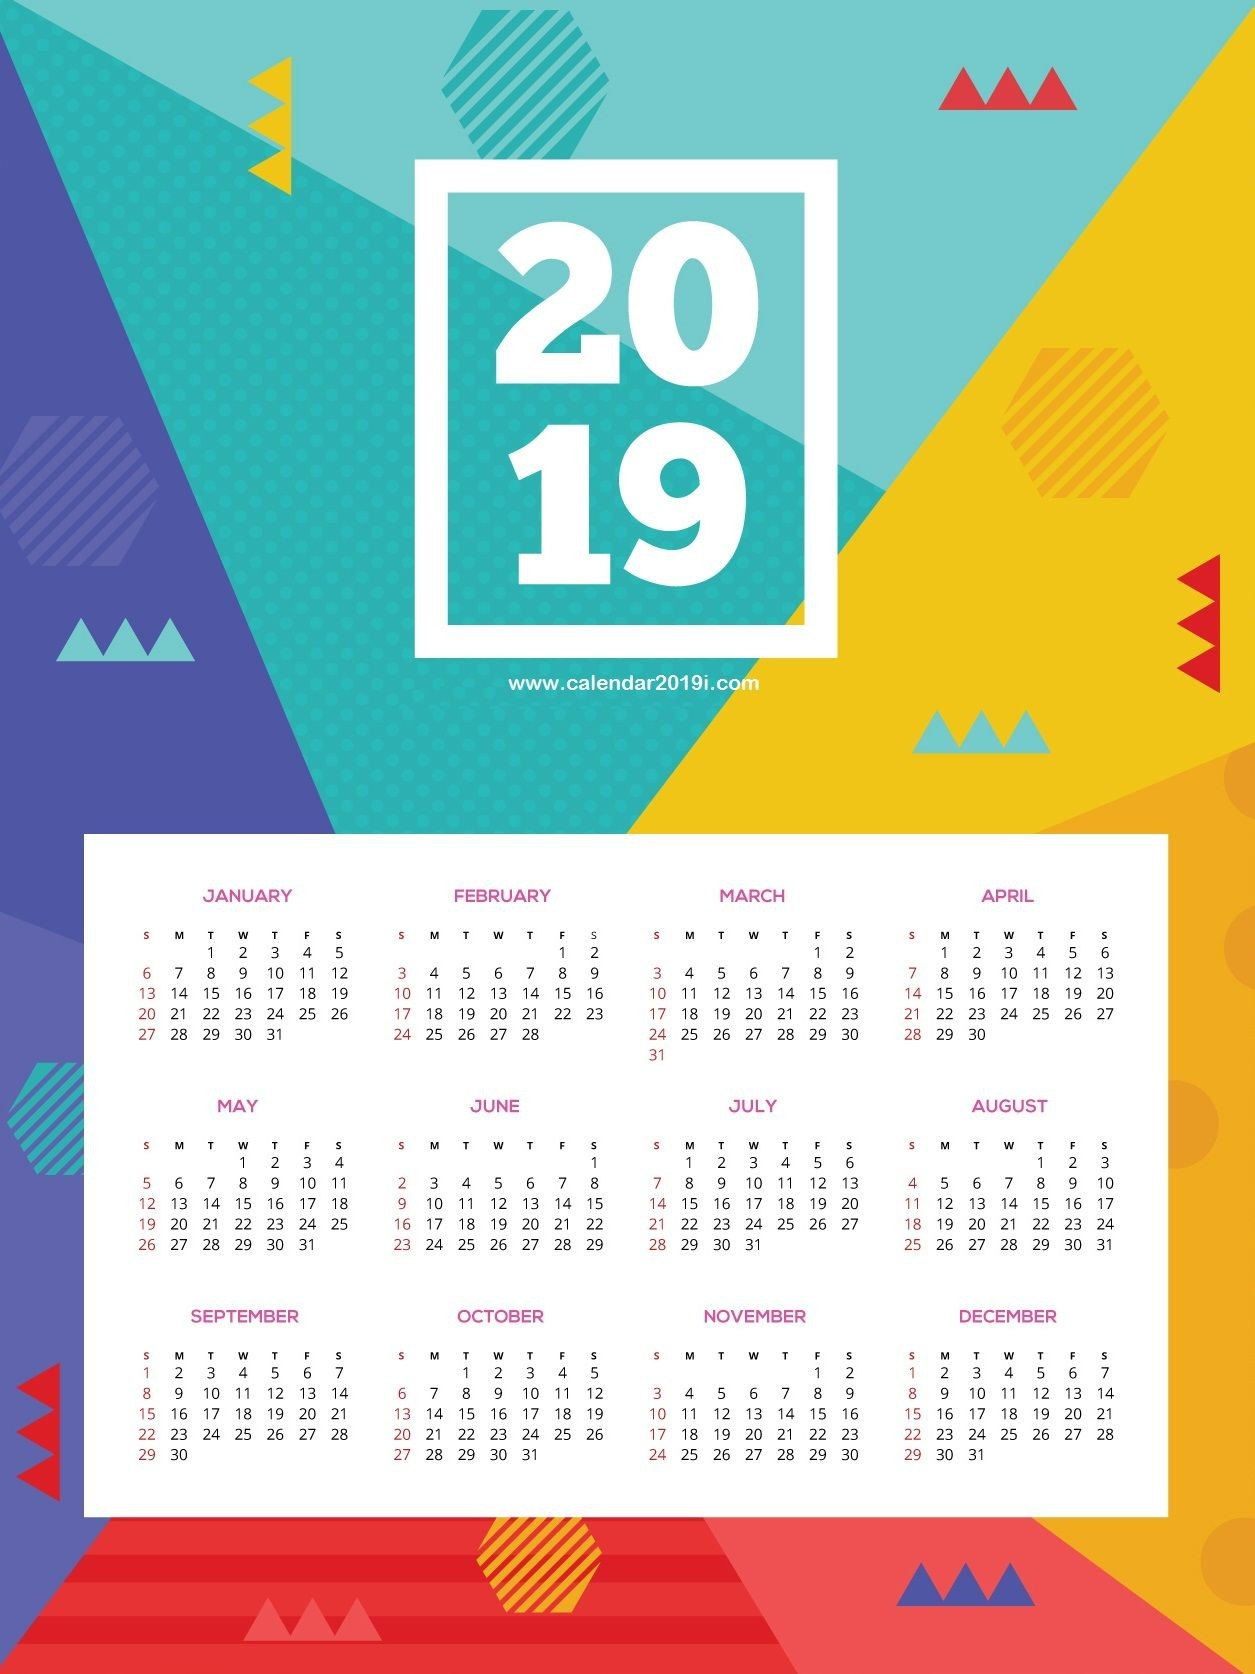 Calendarios Bonitos Imprimir 2019 Más Actual Printable 2019 Hd Wall Calendar